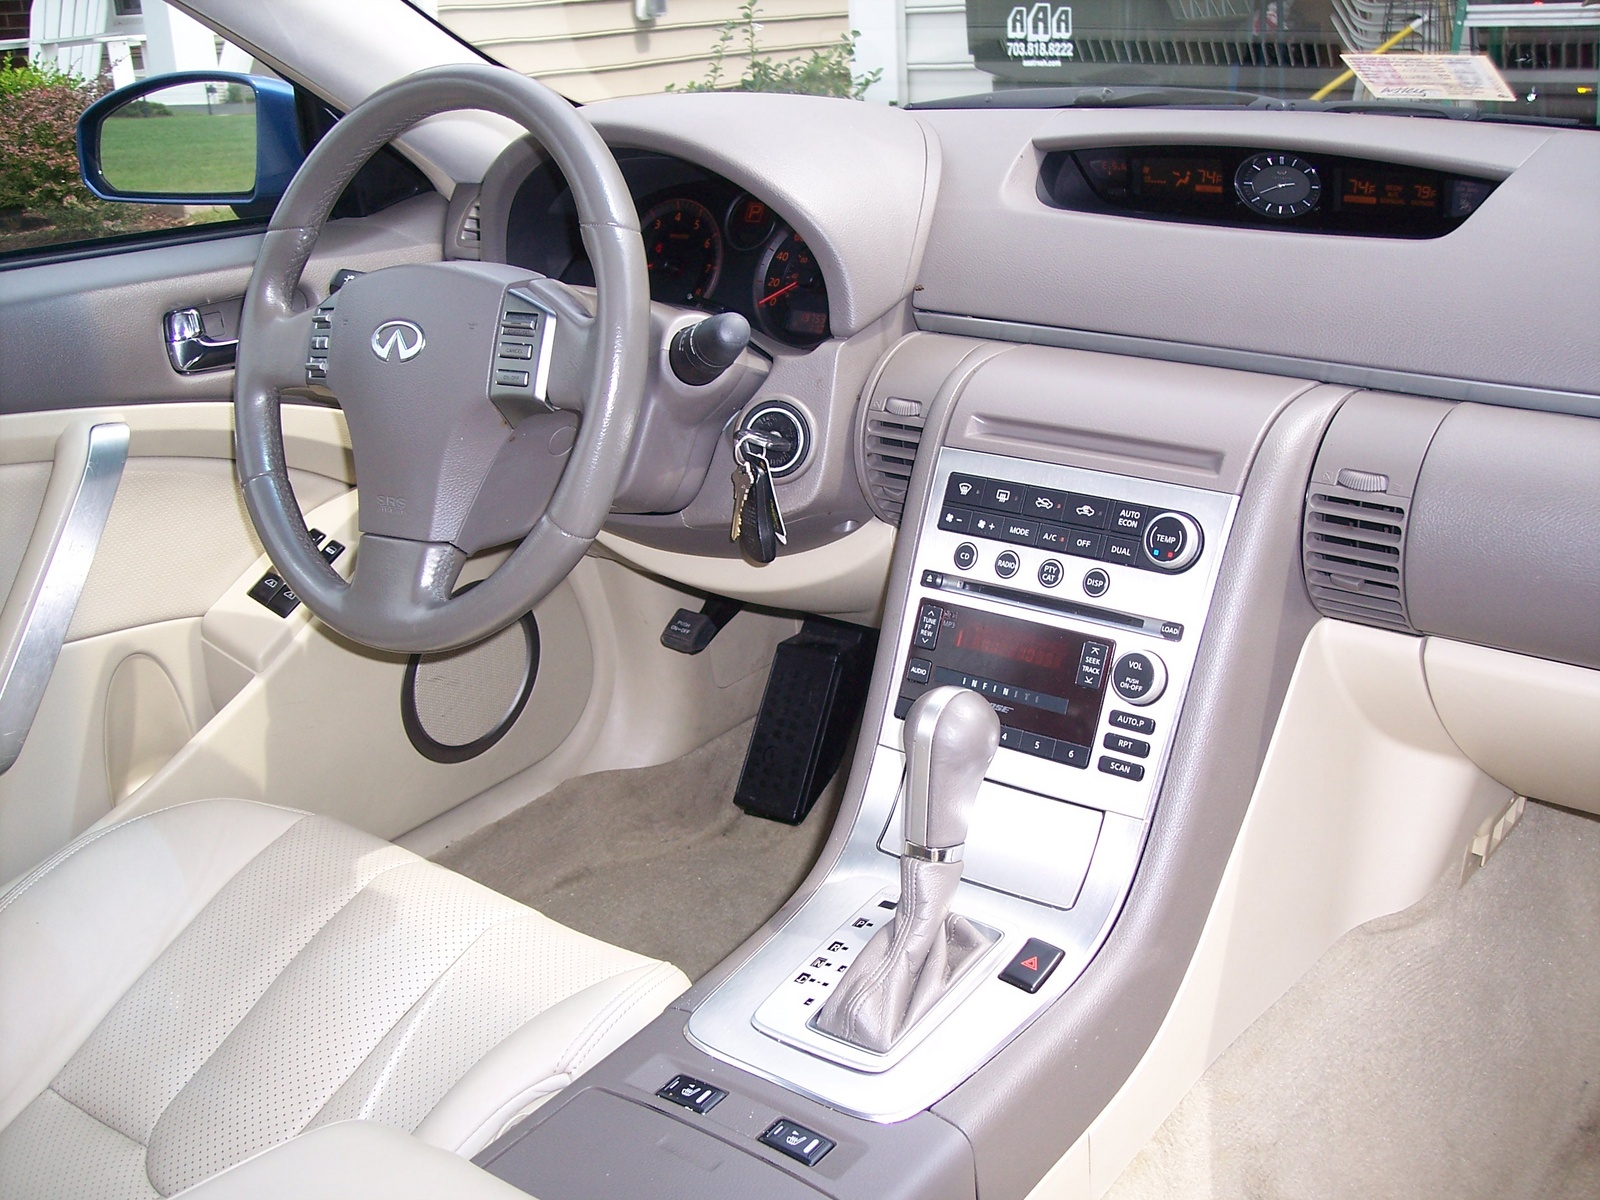 2005 G35 Interior Parts